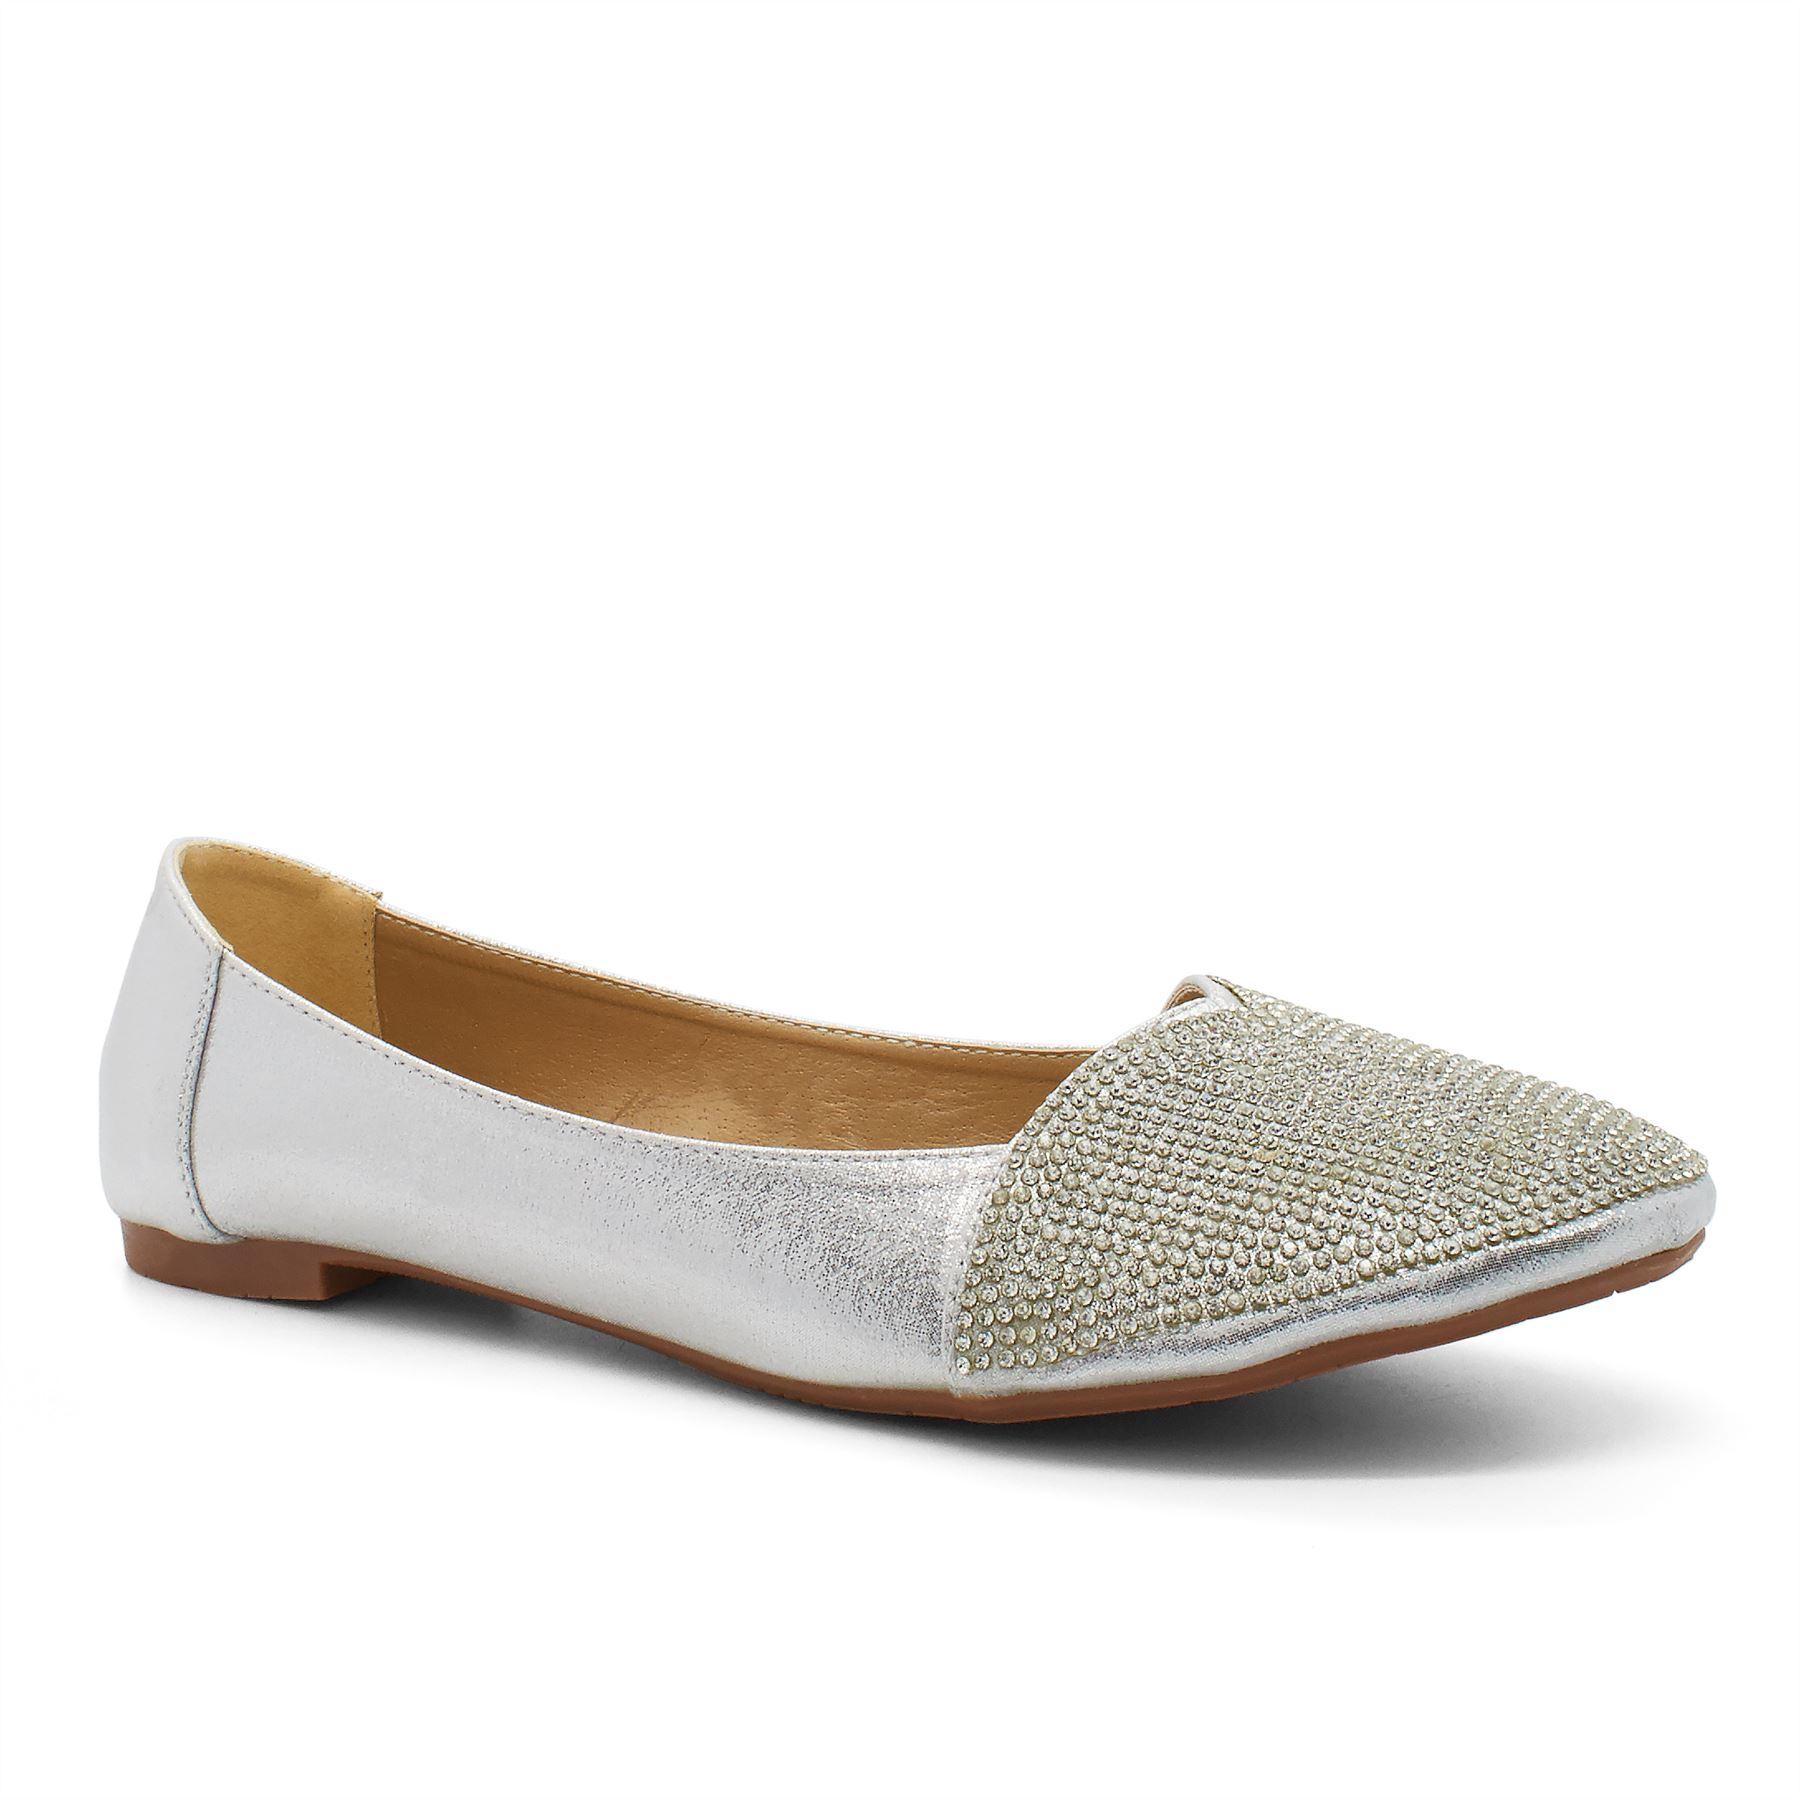 New Womens Flat Diamante Pumps UK Bridal Shoes Size Ballet Dolly Ballerina Slip | EBay